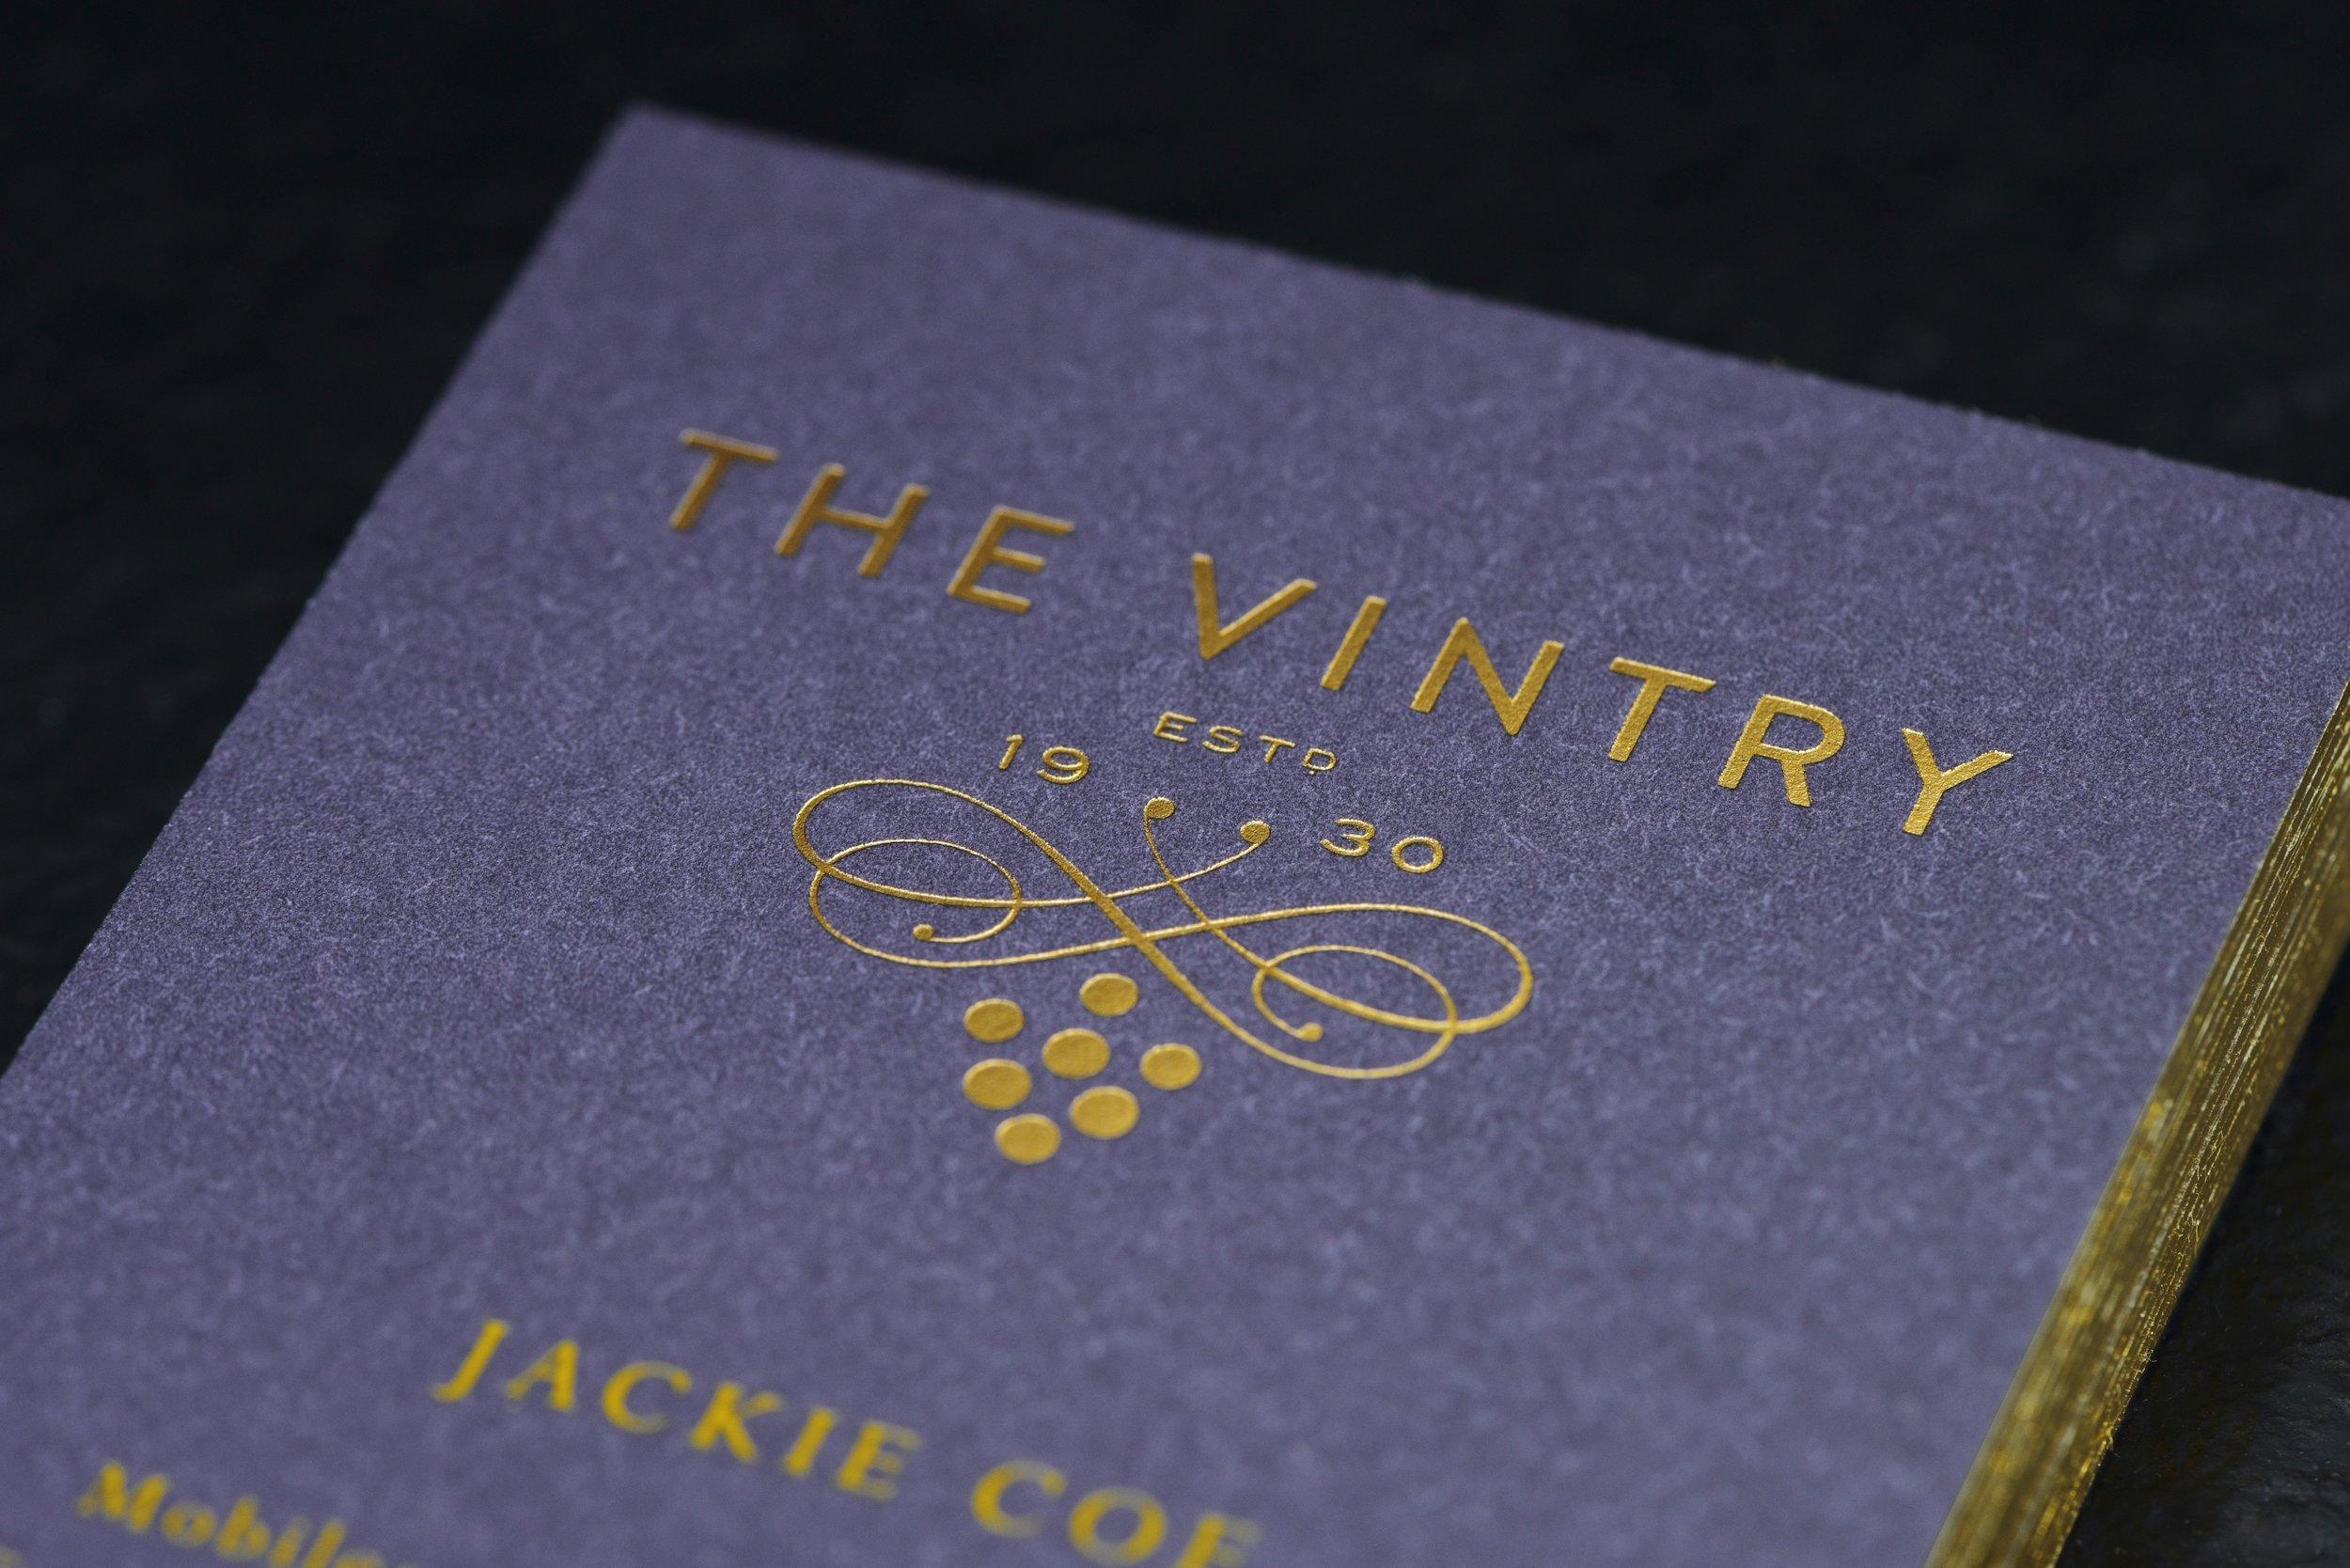 Vintry Business cards detail.JPG